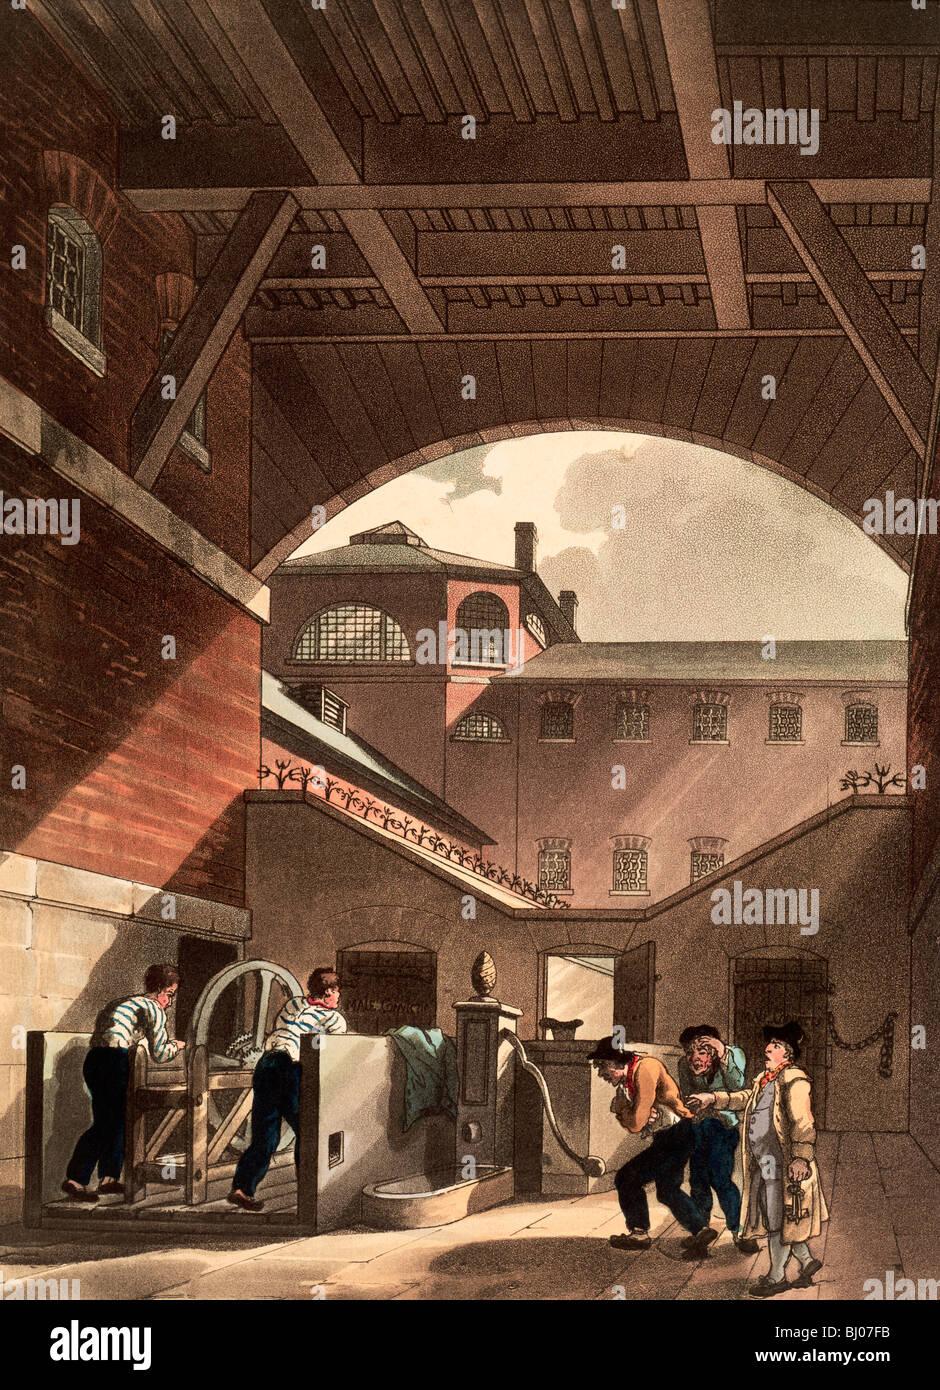 Water engine at Cold Bath Fields Prison, London, 1808. Artist: Augustus Charles Pugin - Stock Image